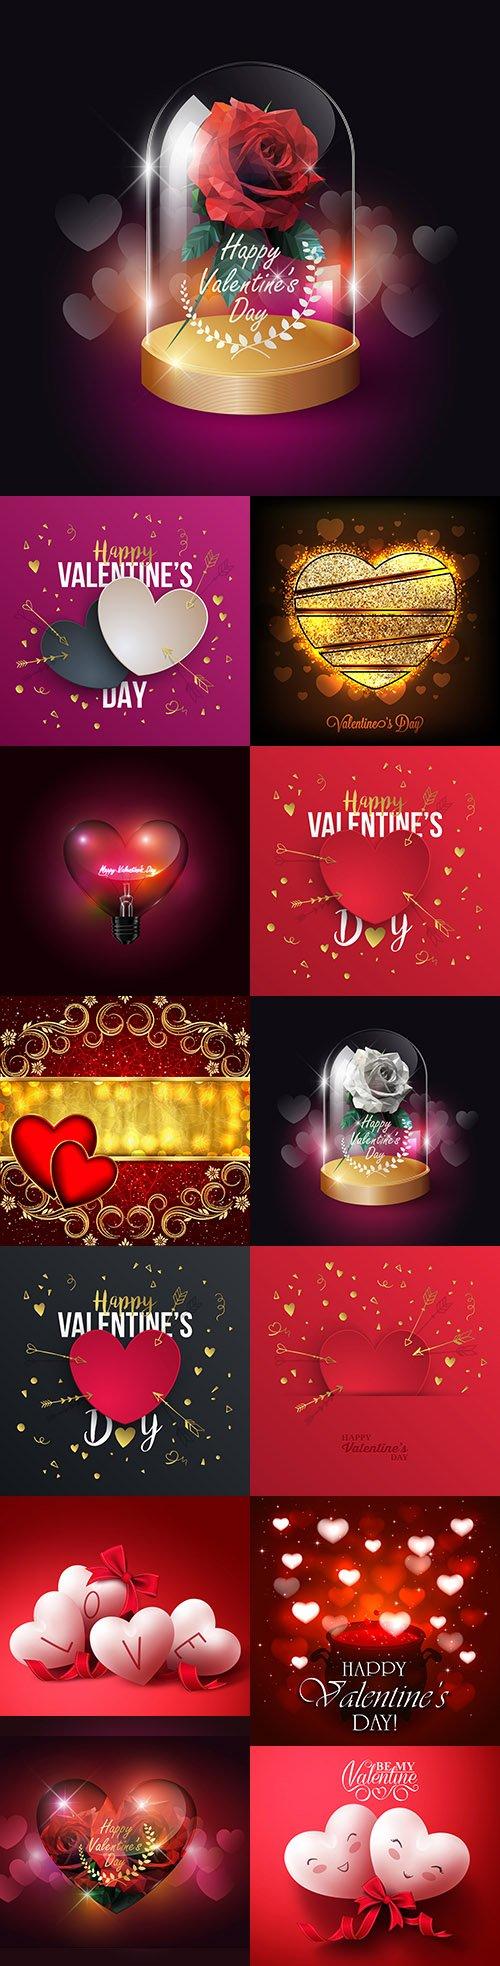 Happy Valentine's Day romantic decorative illustrations 28